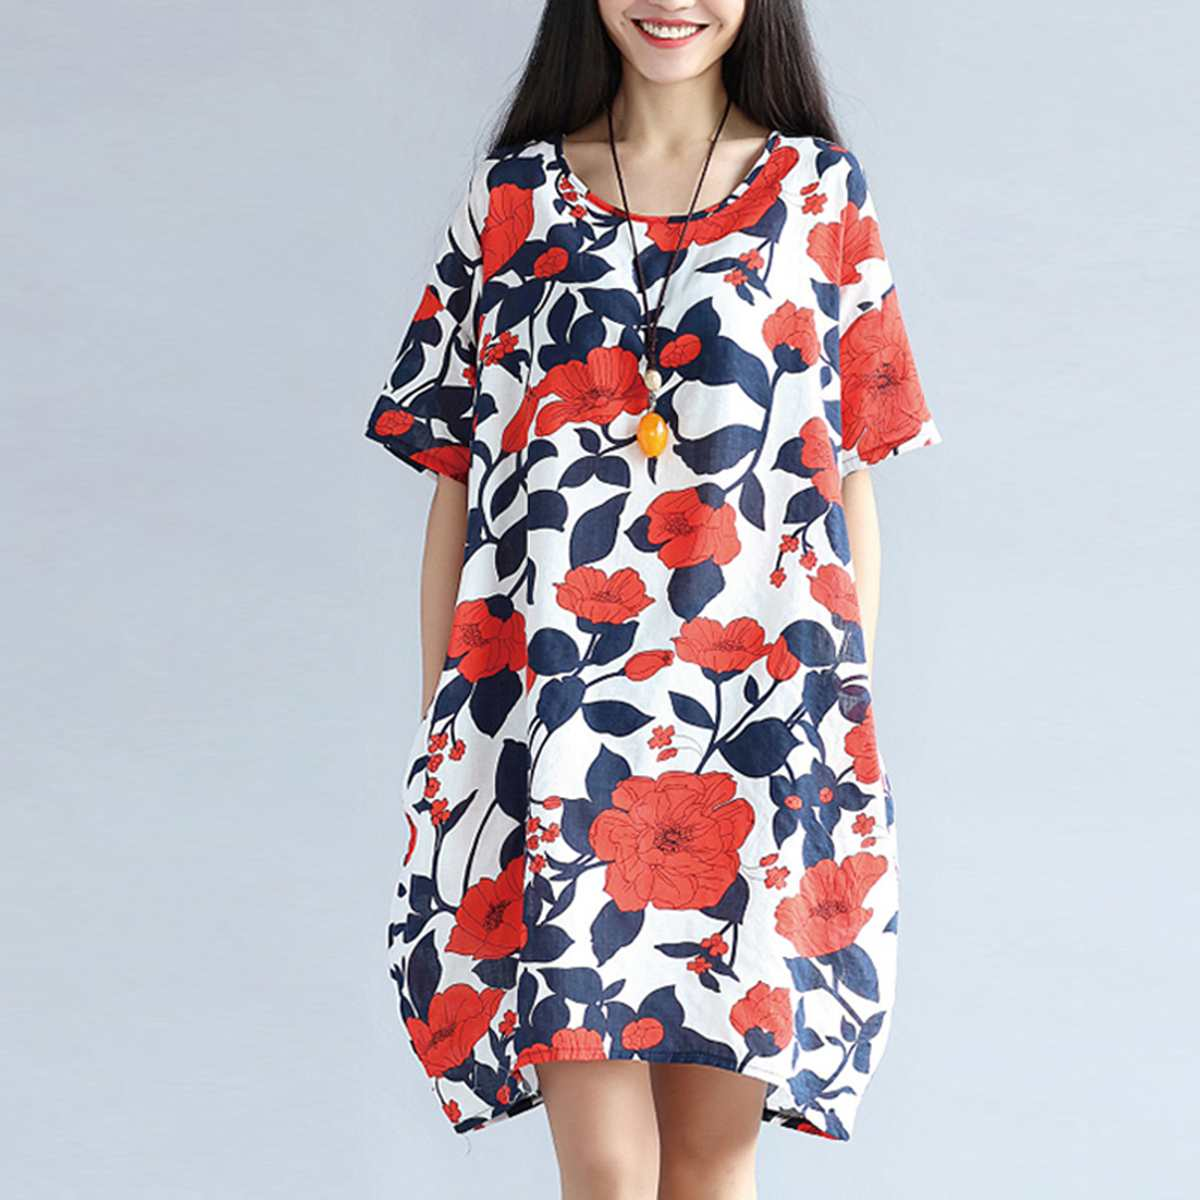 Plus Size 5XL Vintage Floral Print Dress Women Summer Cotton Loose Round Neck Dresses Elegant Retro Robe Casual Midi Vestidos